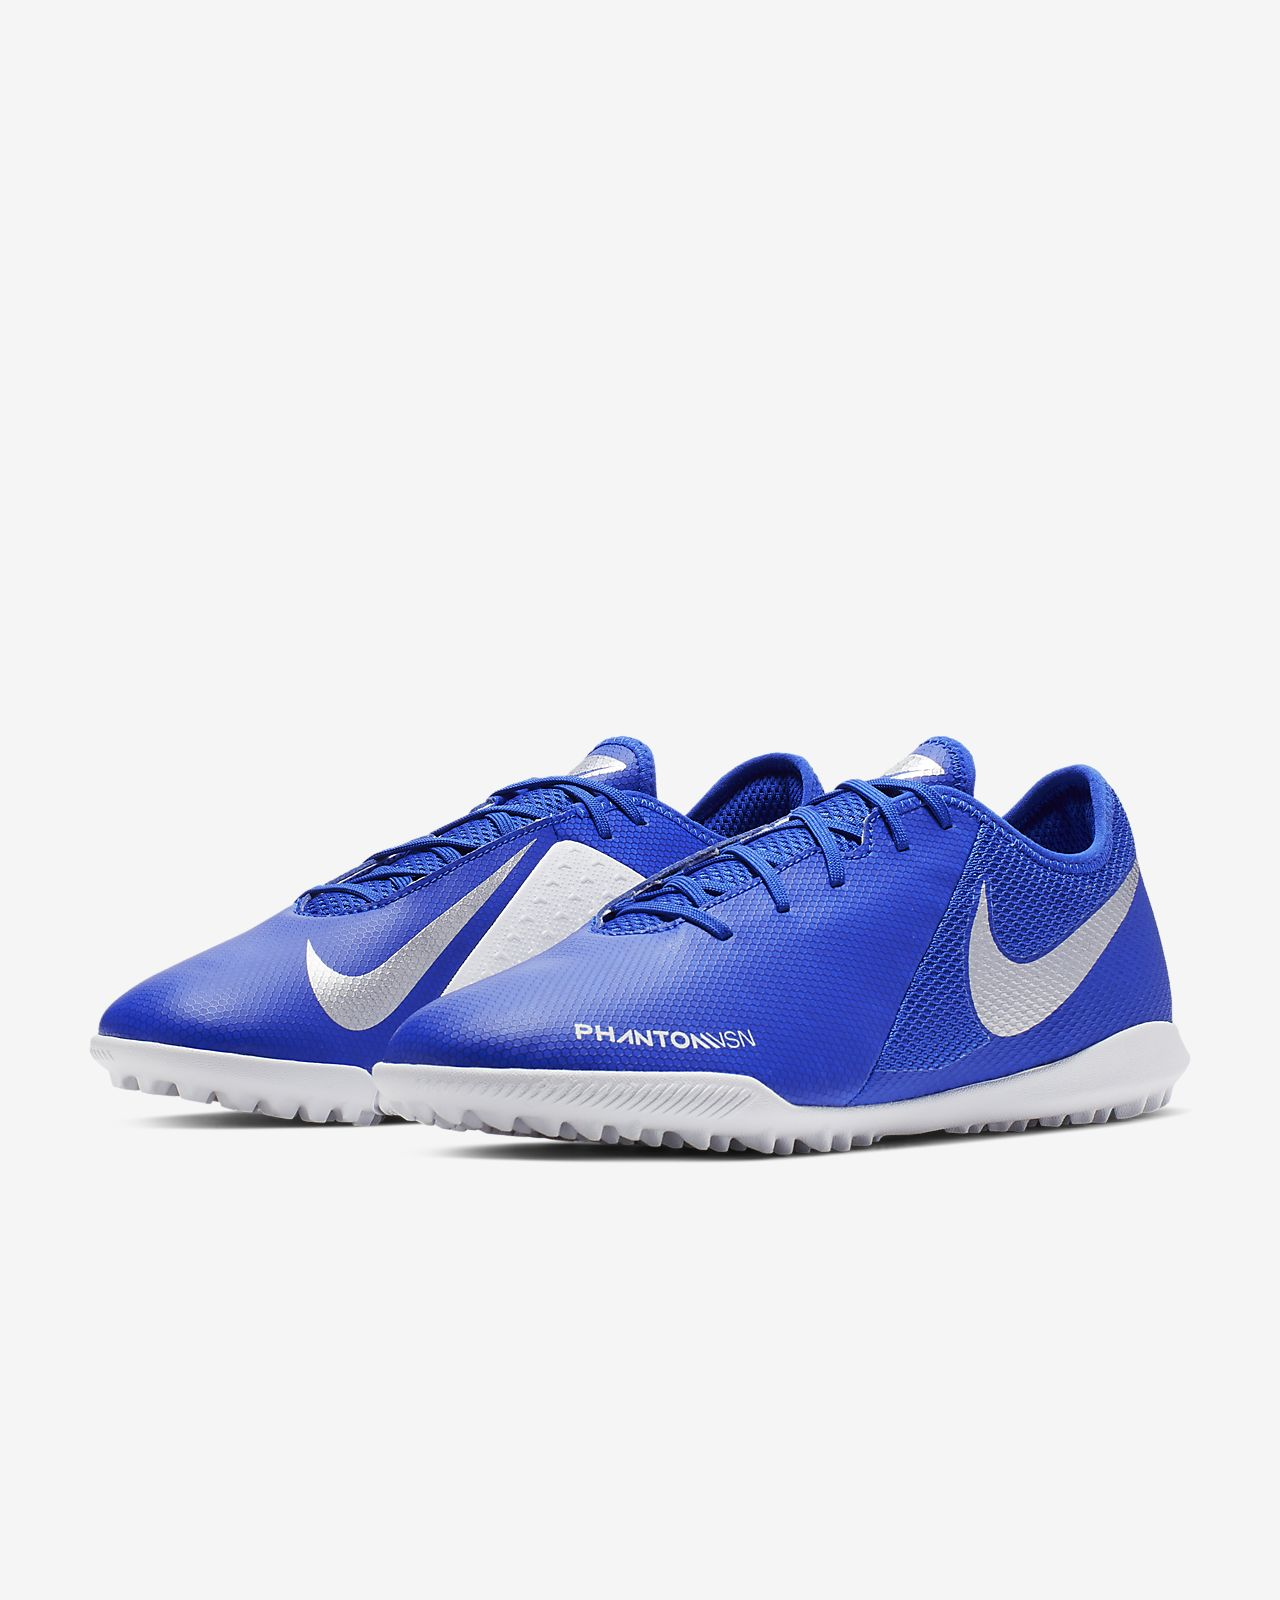 size 40 42f07 643fc Fotbollssko för grus/turf Nike Phantom Vision Academy. Nike.com SE